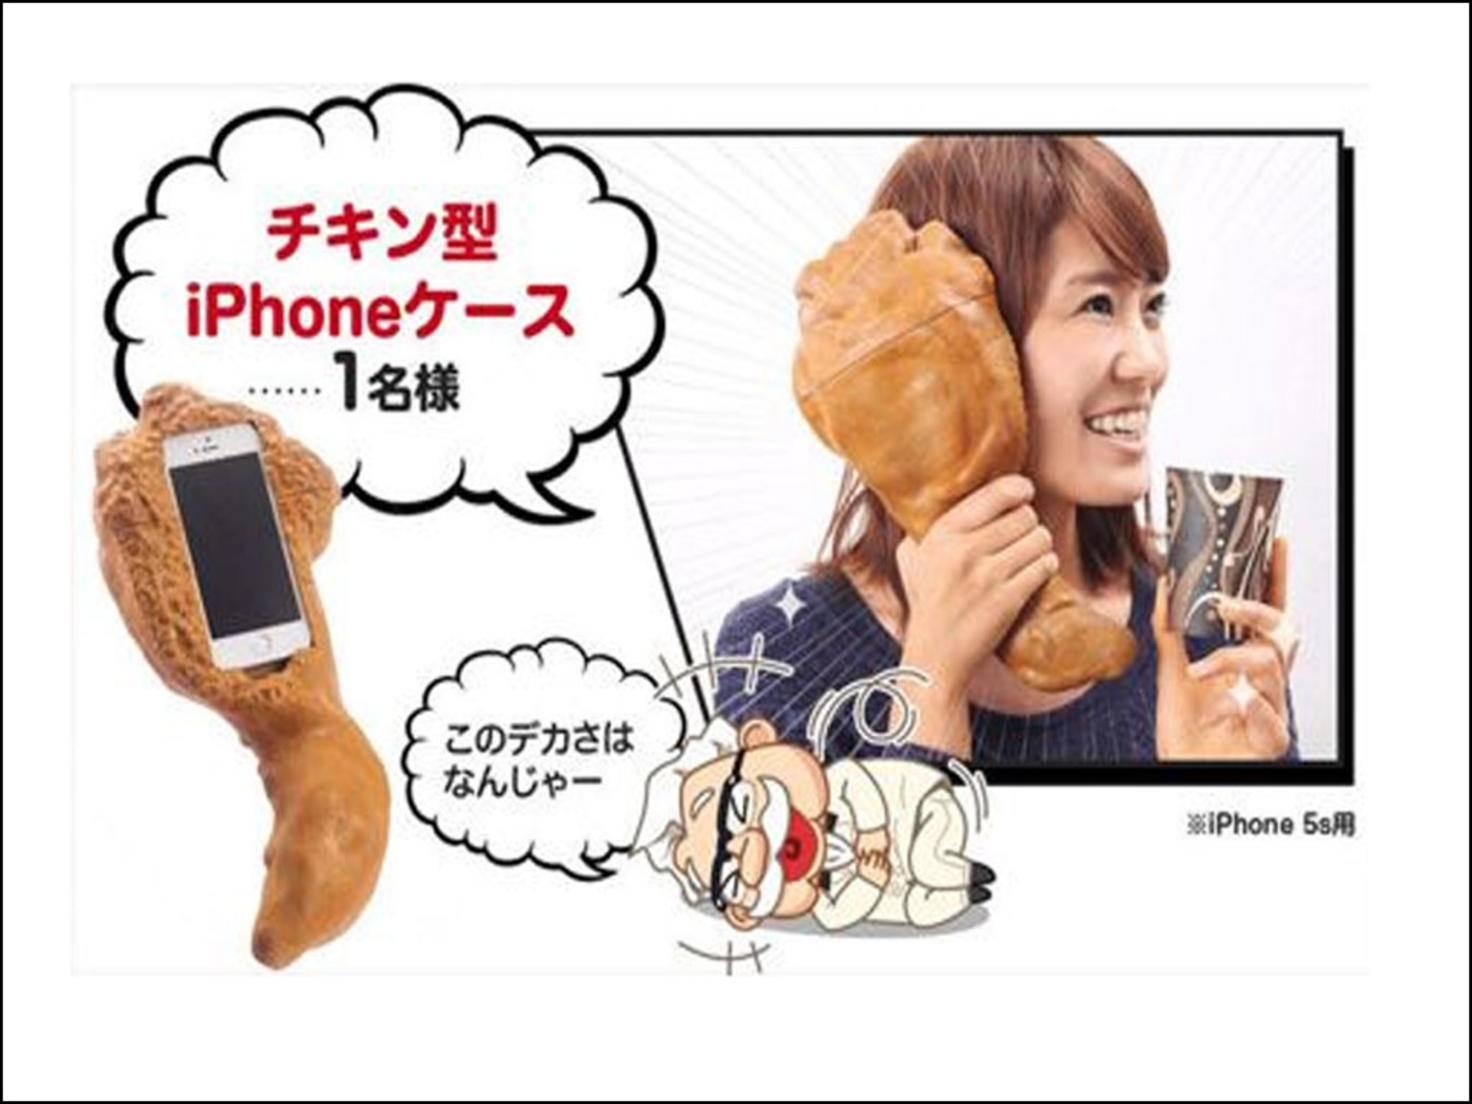 Japan Gadgets